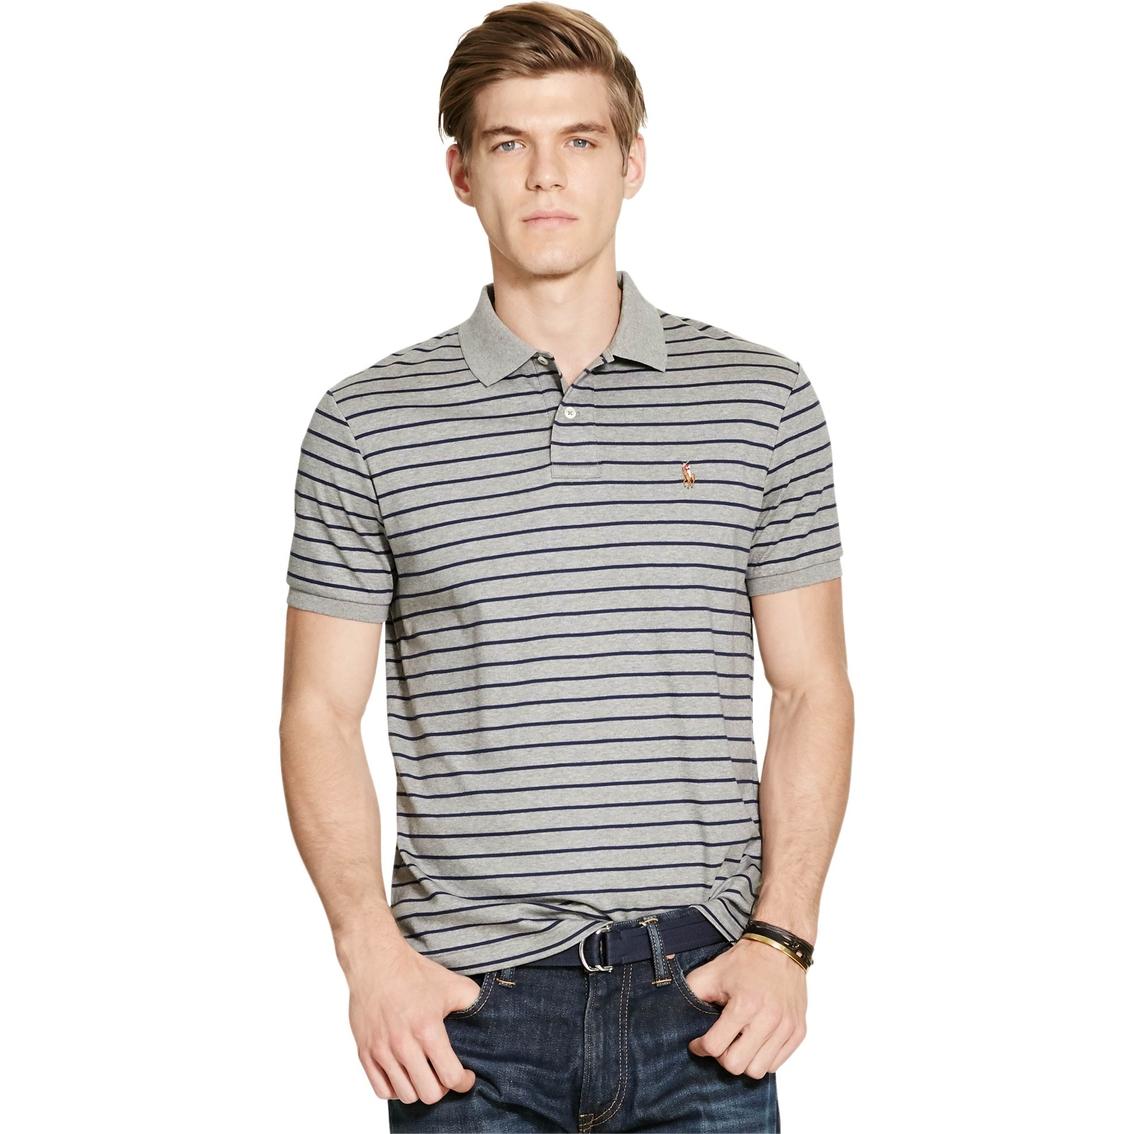 252cc626 Polo Ralph Lauren Striped Pima Soft Touch Shirt | Polo Ralph Lauren ...